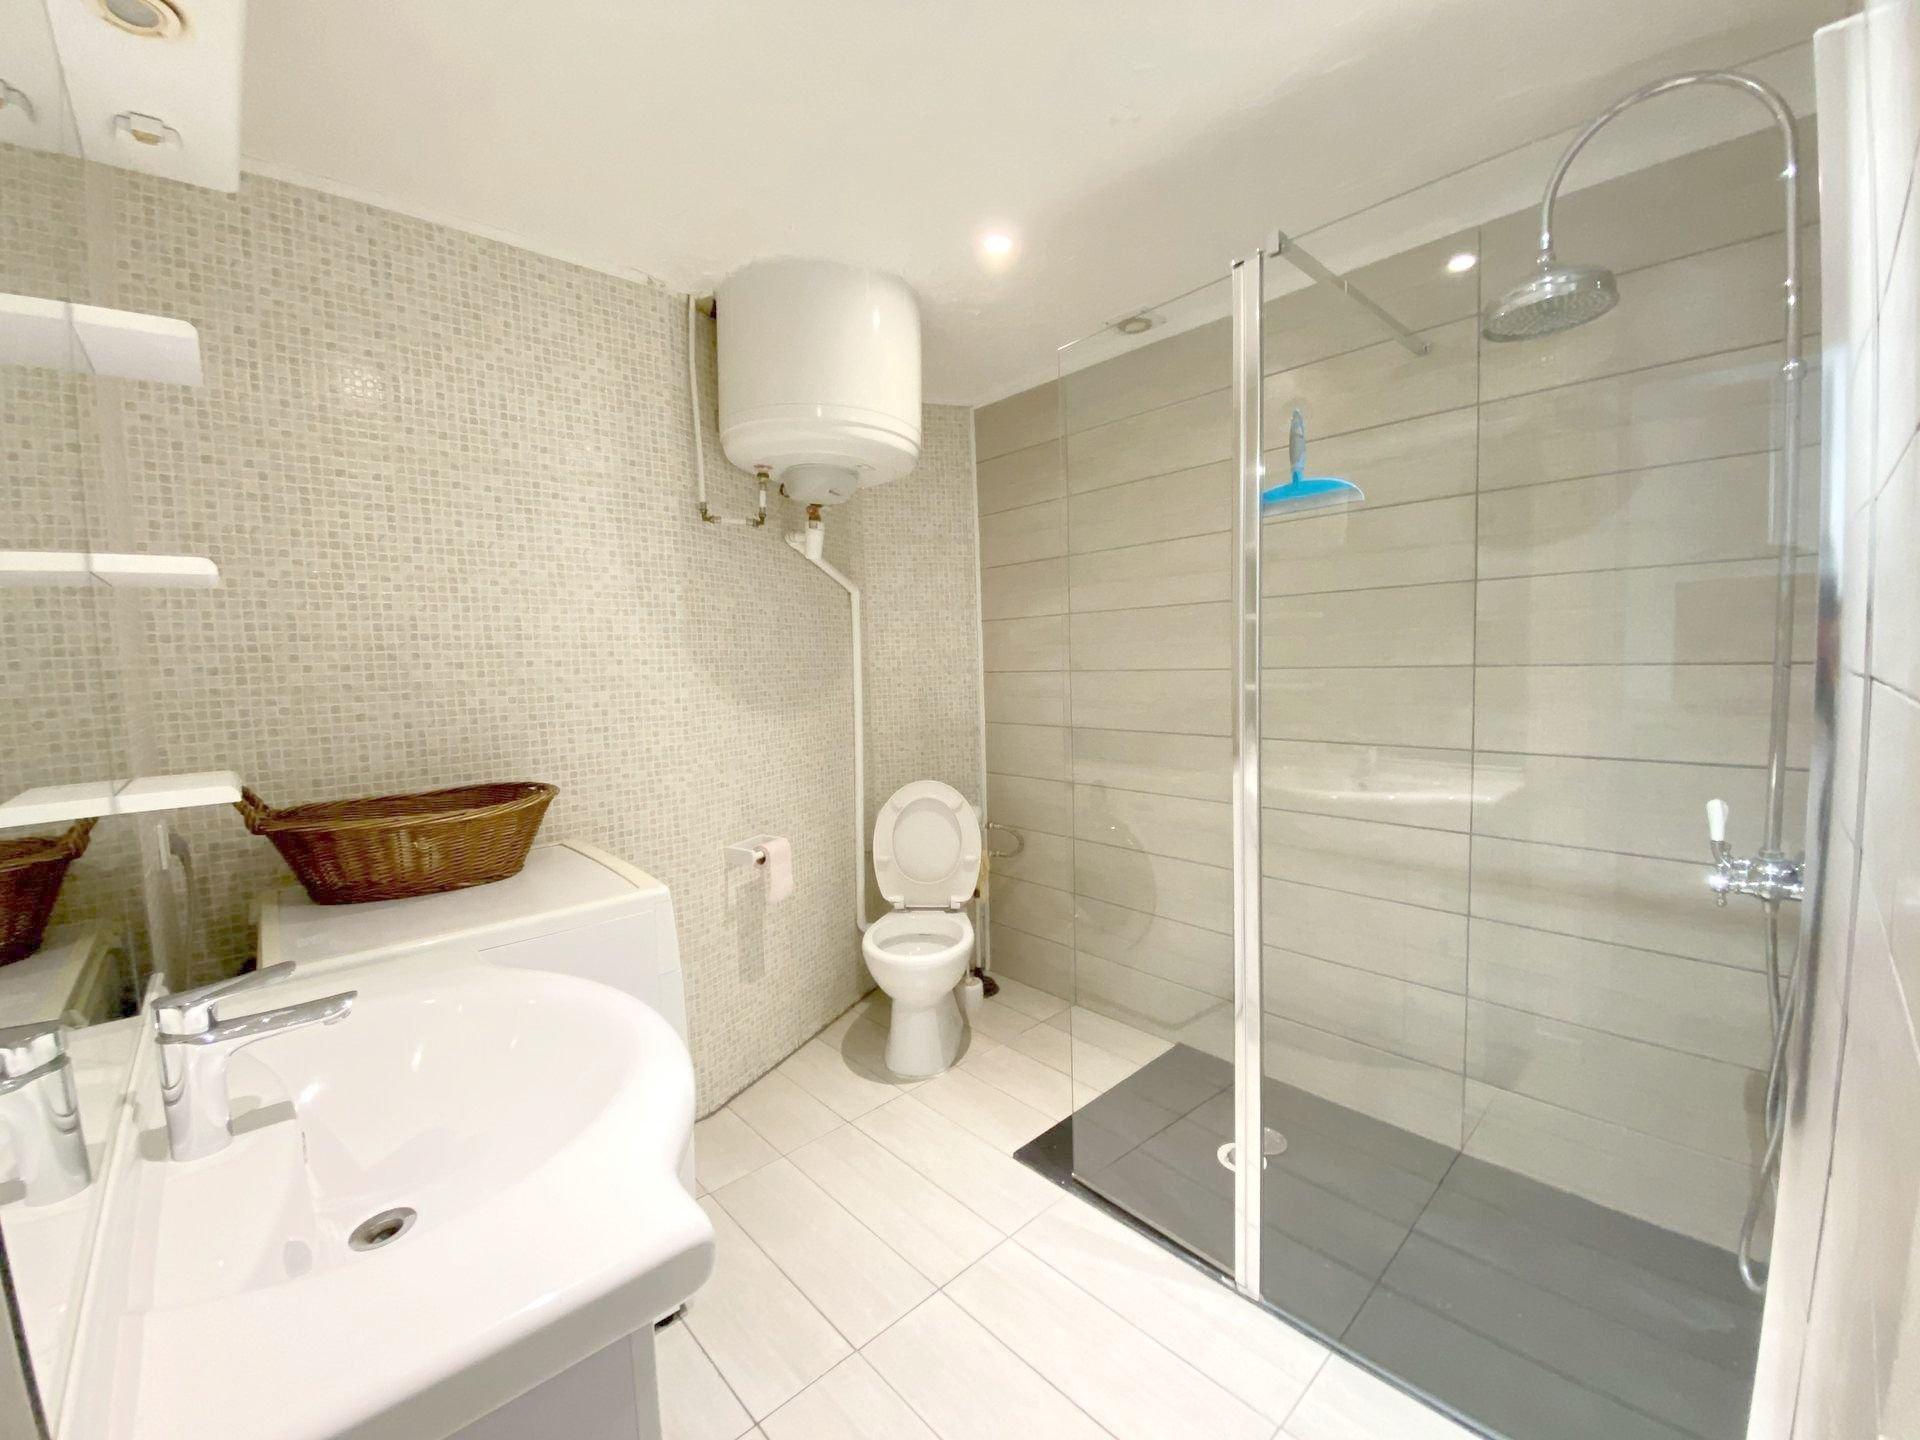 Vieil Antibes/Port Vauban - 2 Rooms